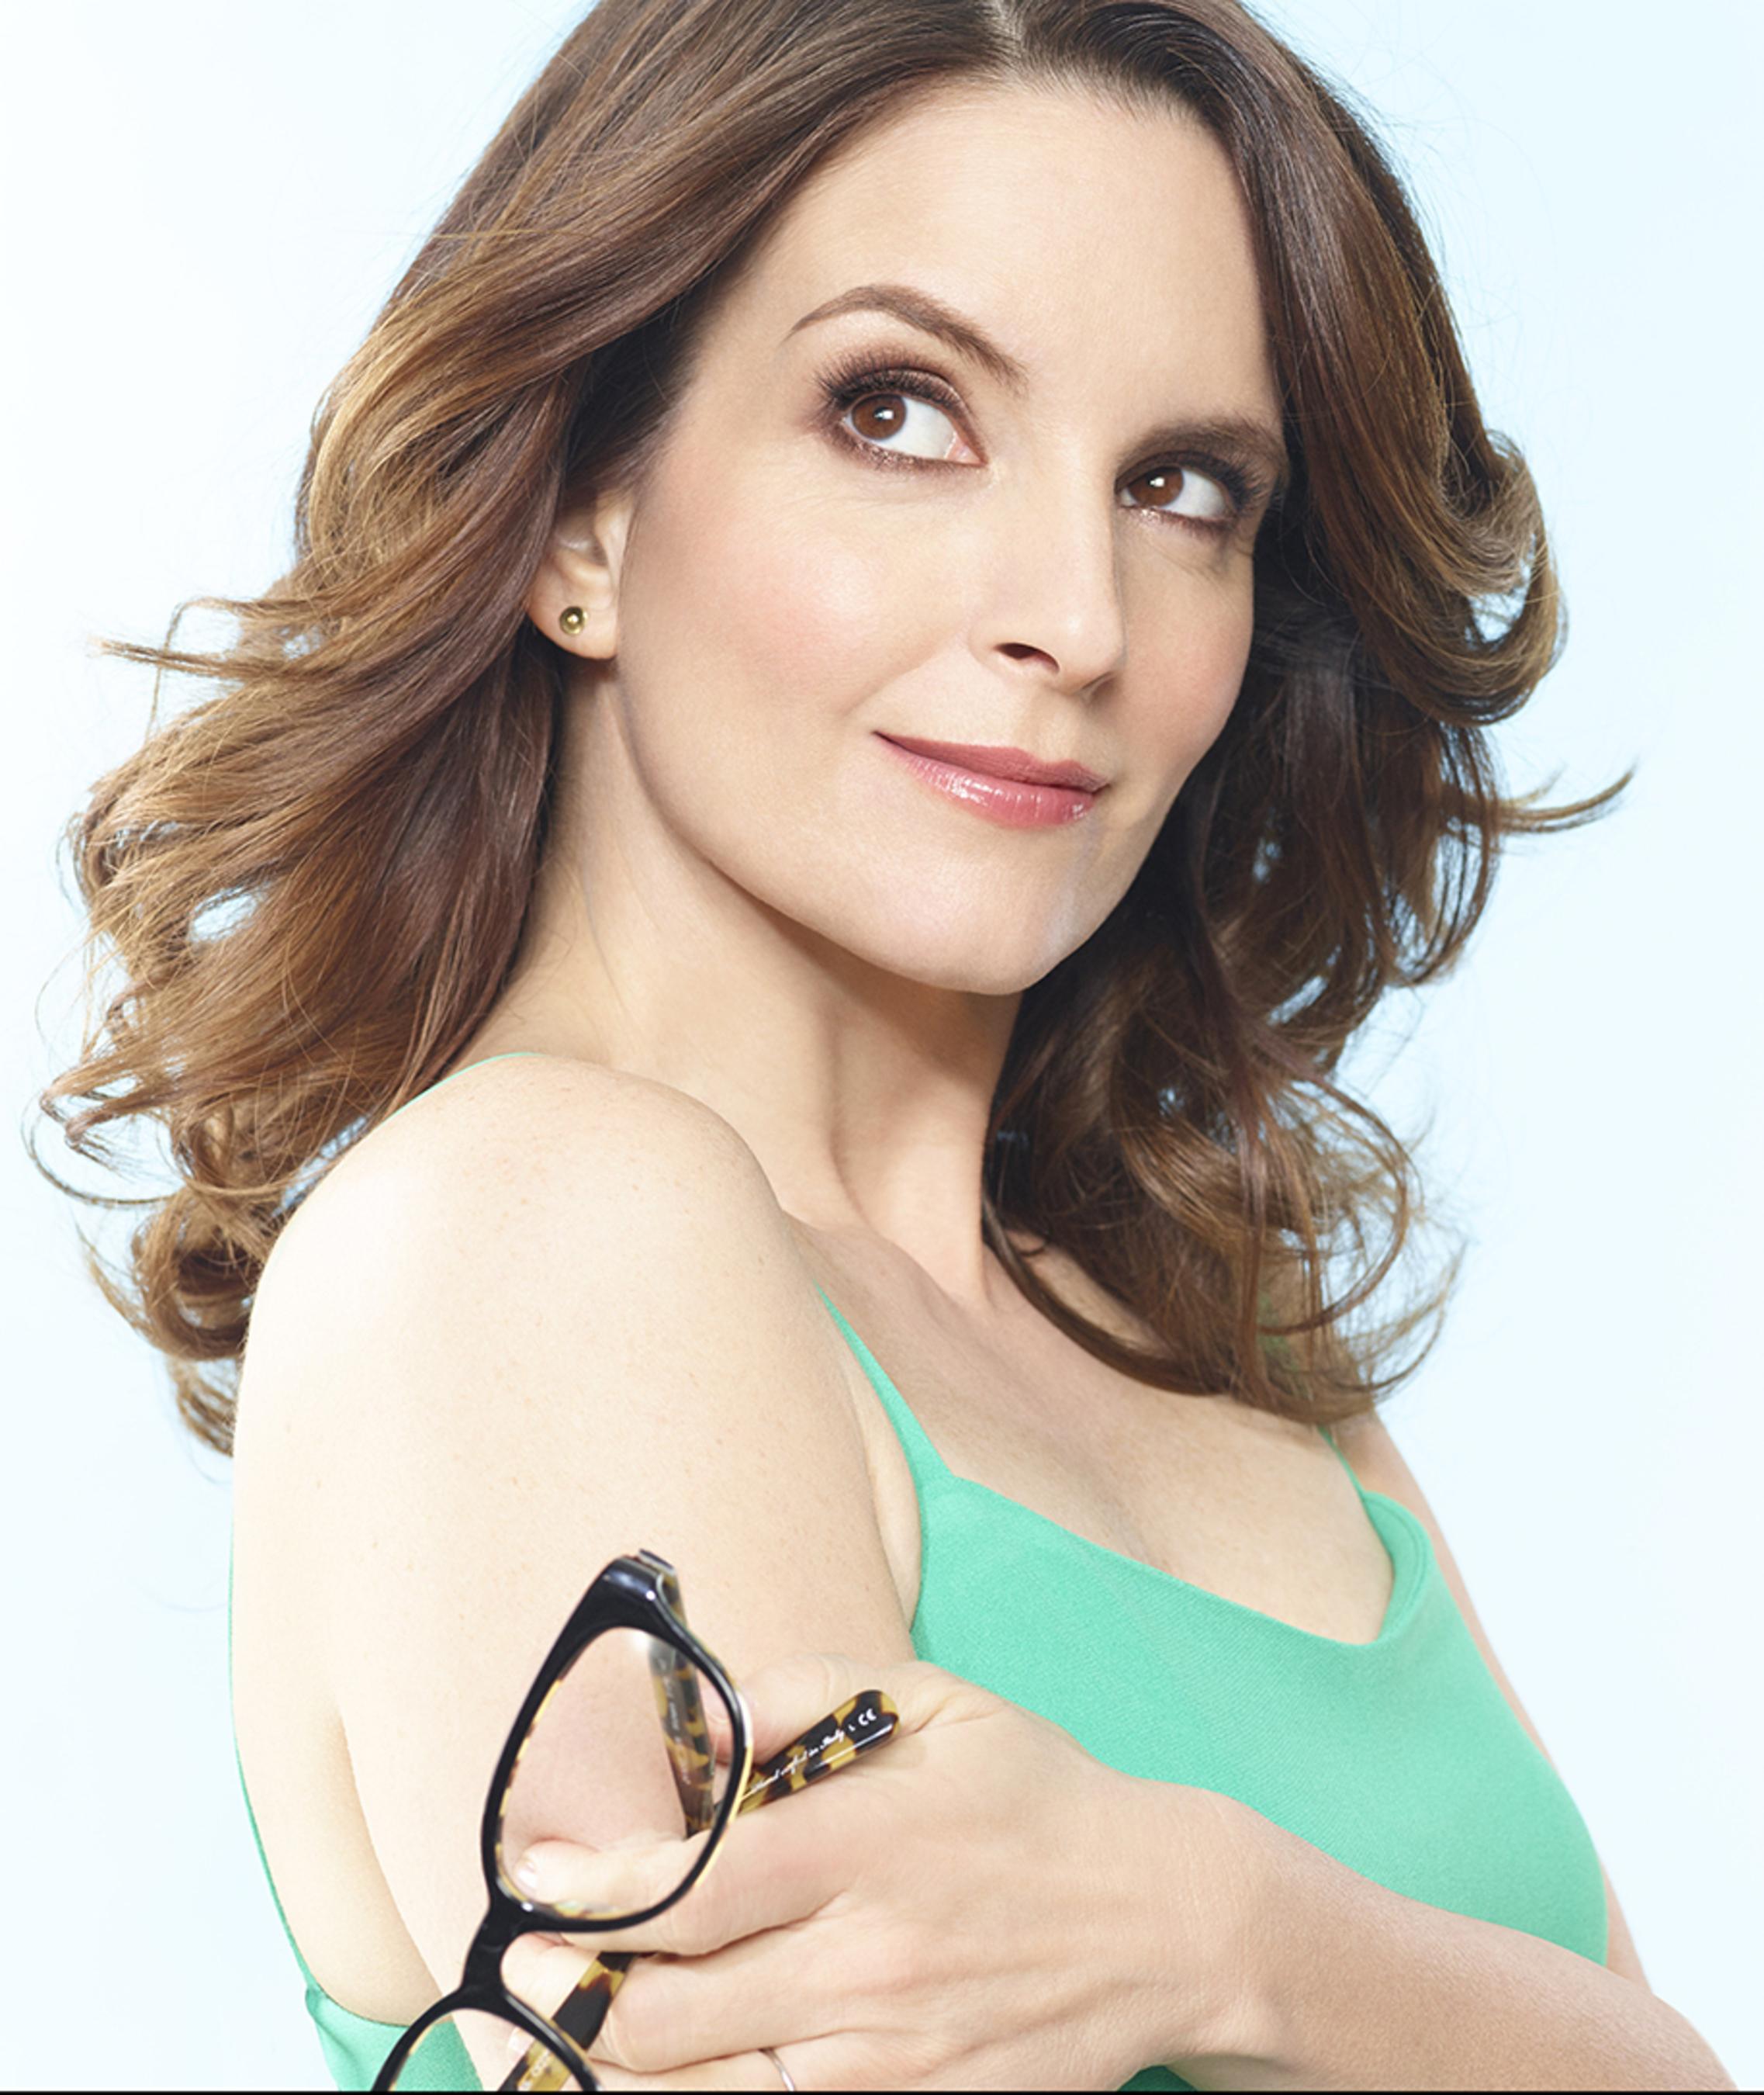 Garnier Announces Tina Fey as the New Skincare Spokesperson (PRNewsFoto/Garnier)